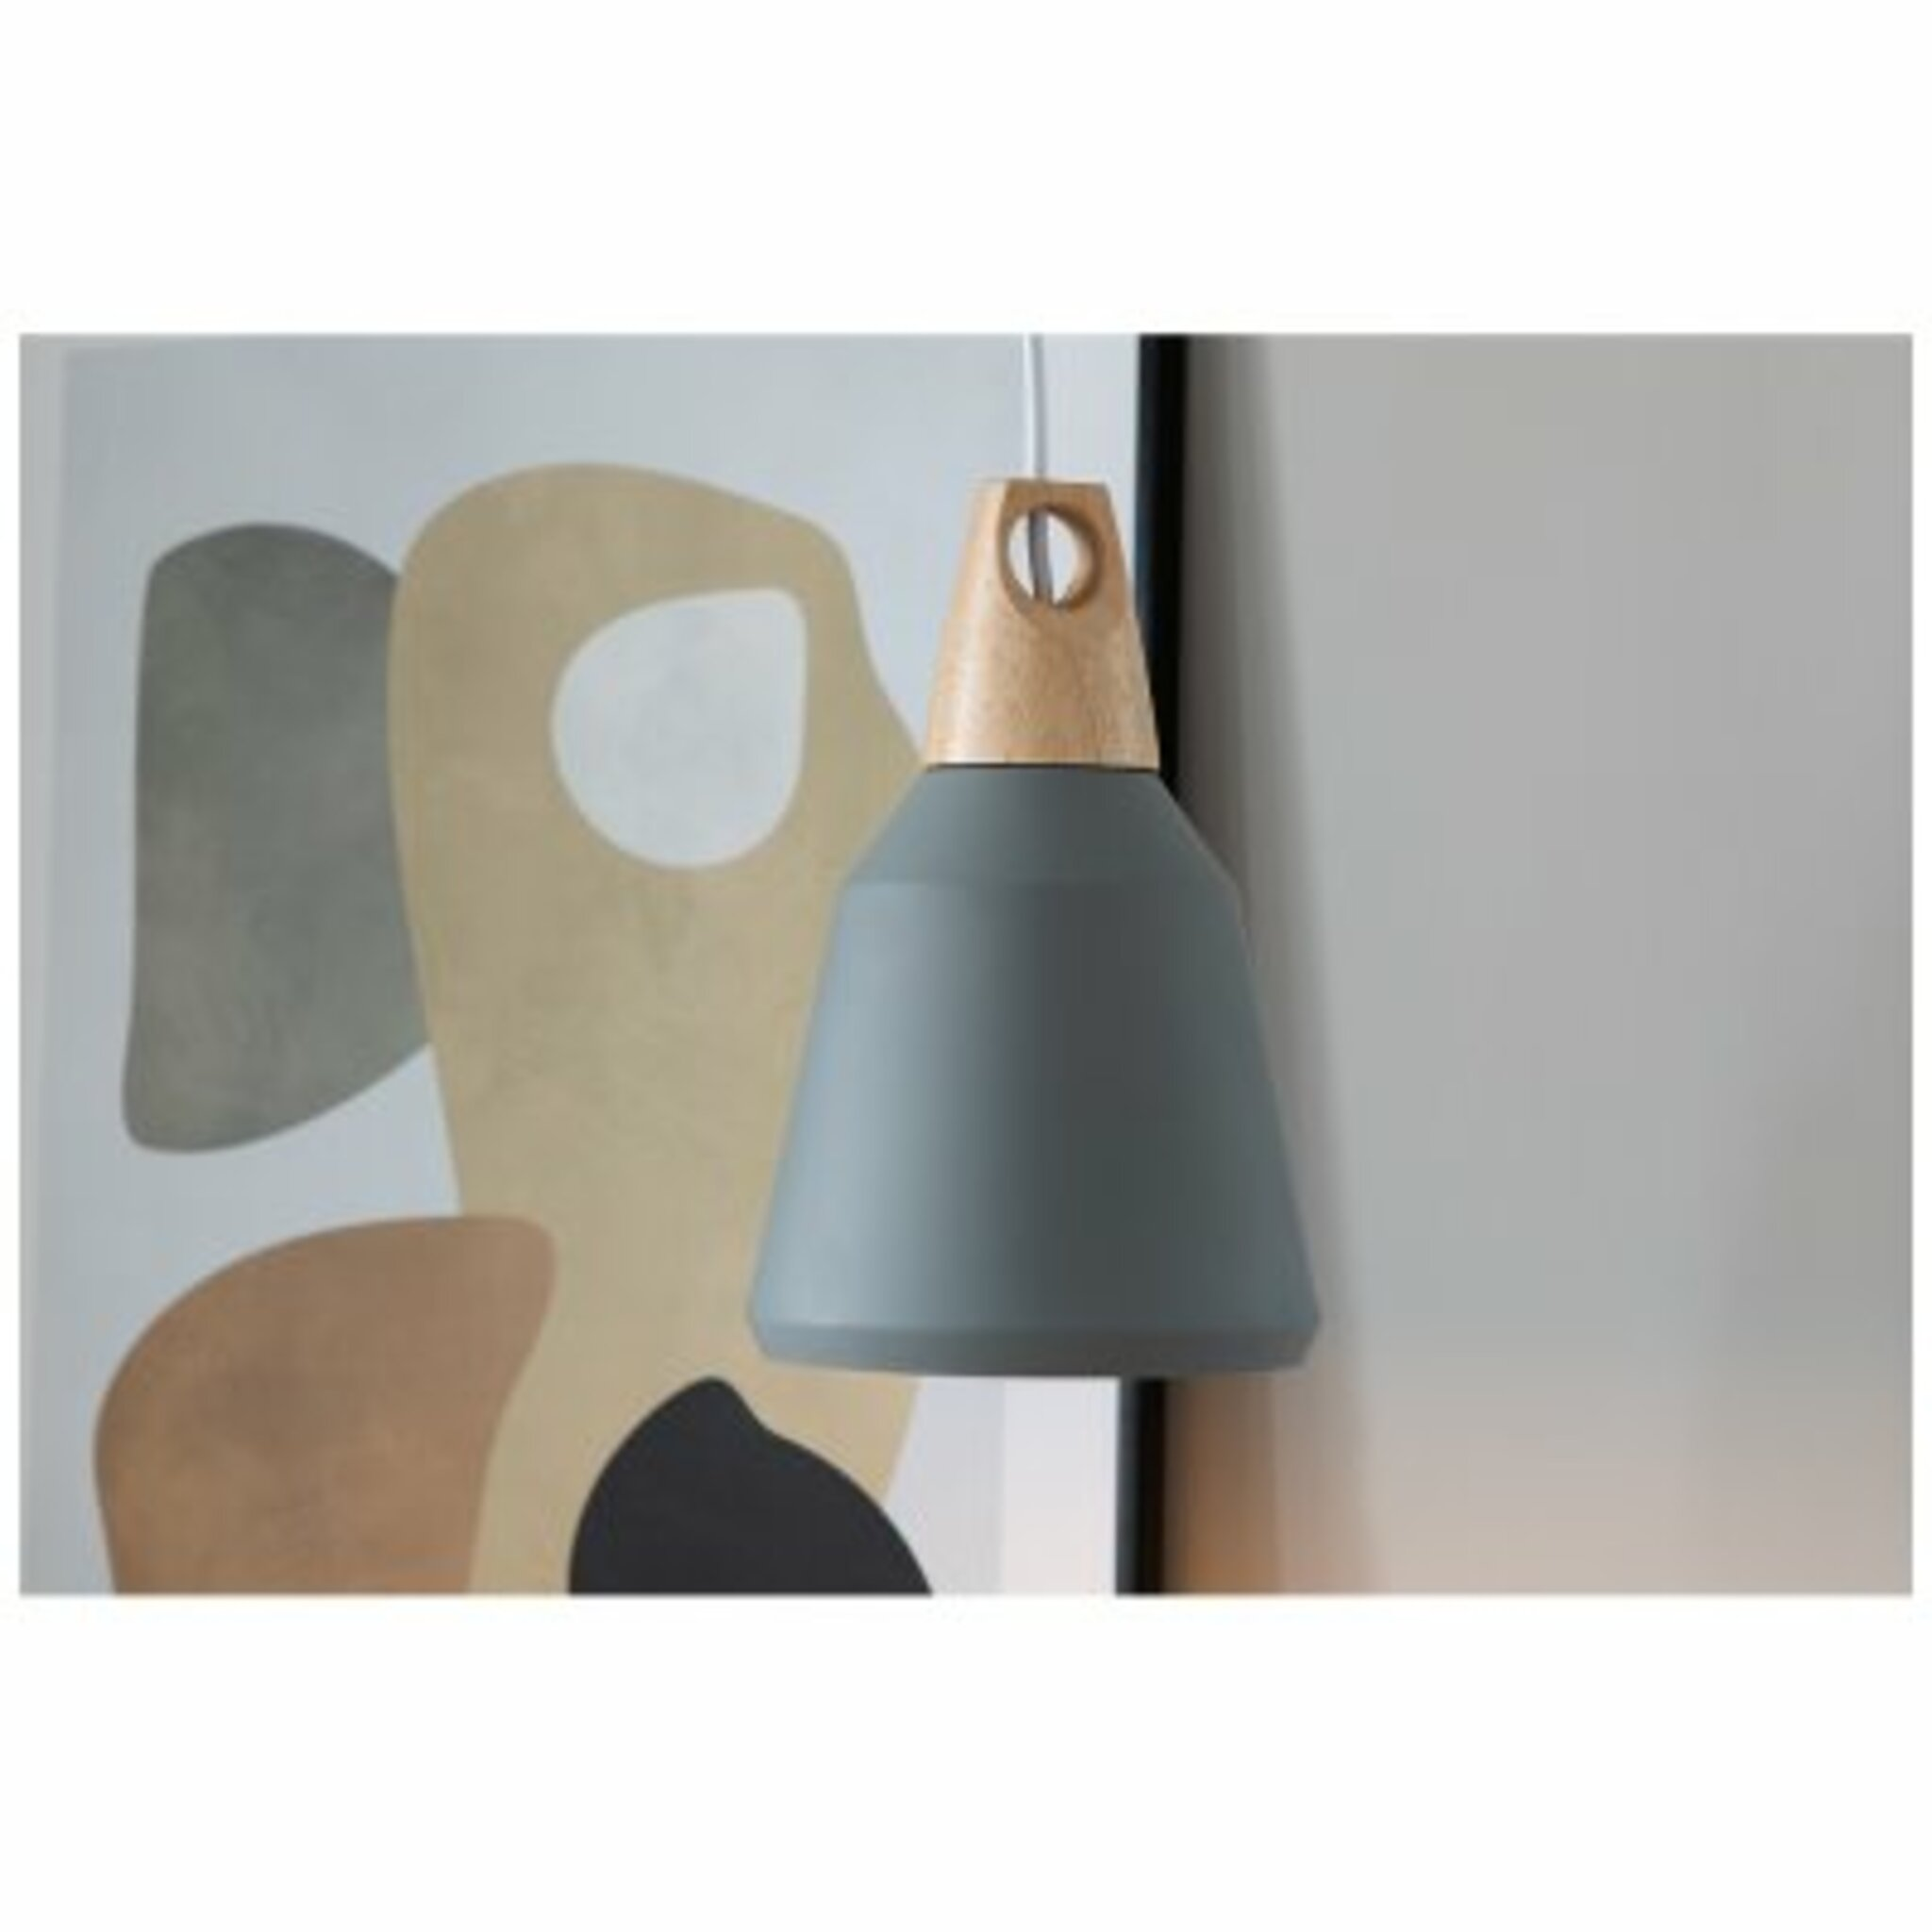 Taklampa Nao 16x25cm,  grå trä/natur